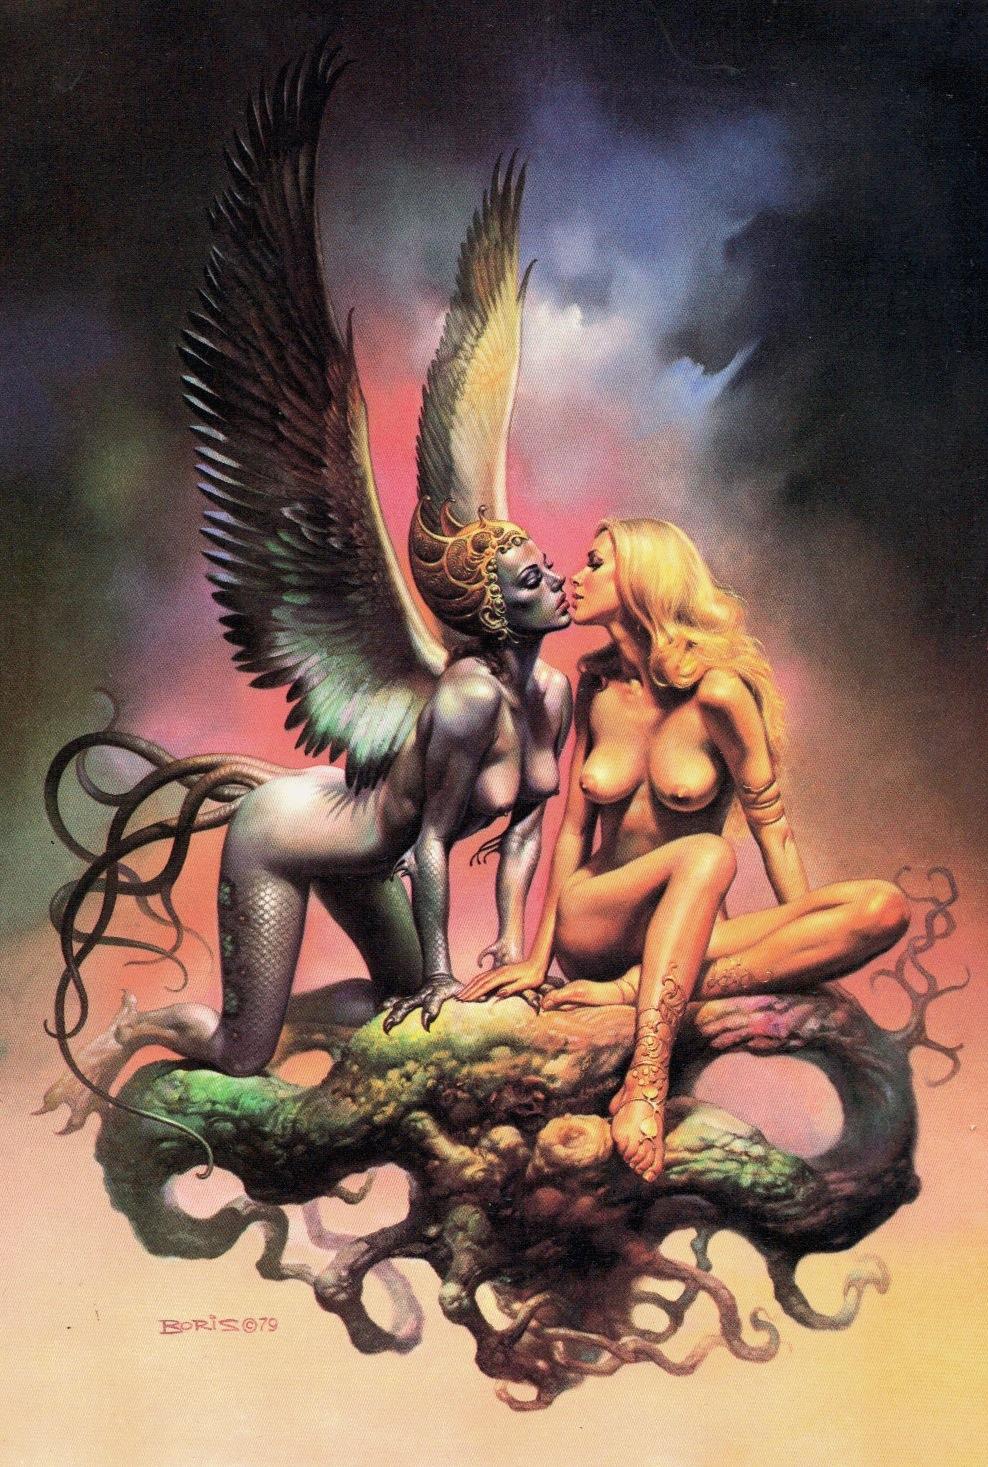 Opinion erotic monster art speaking, advise